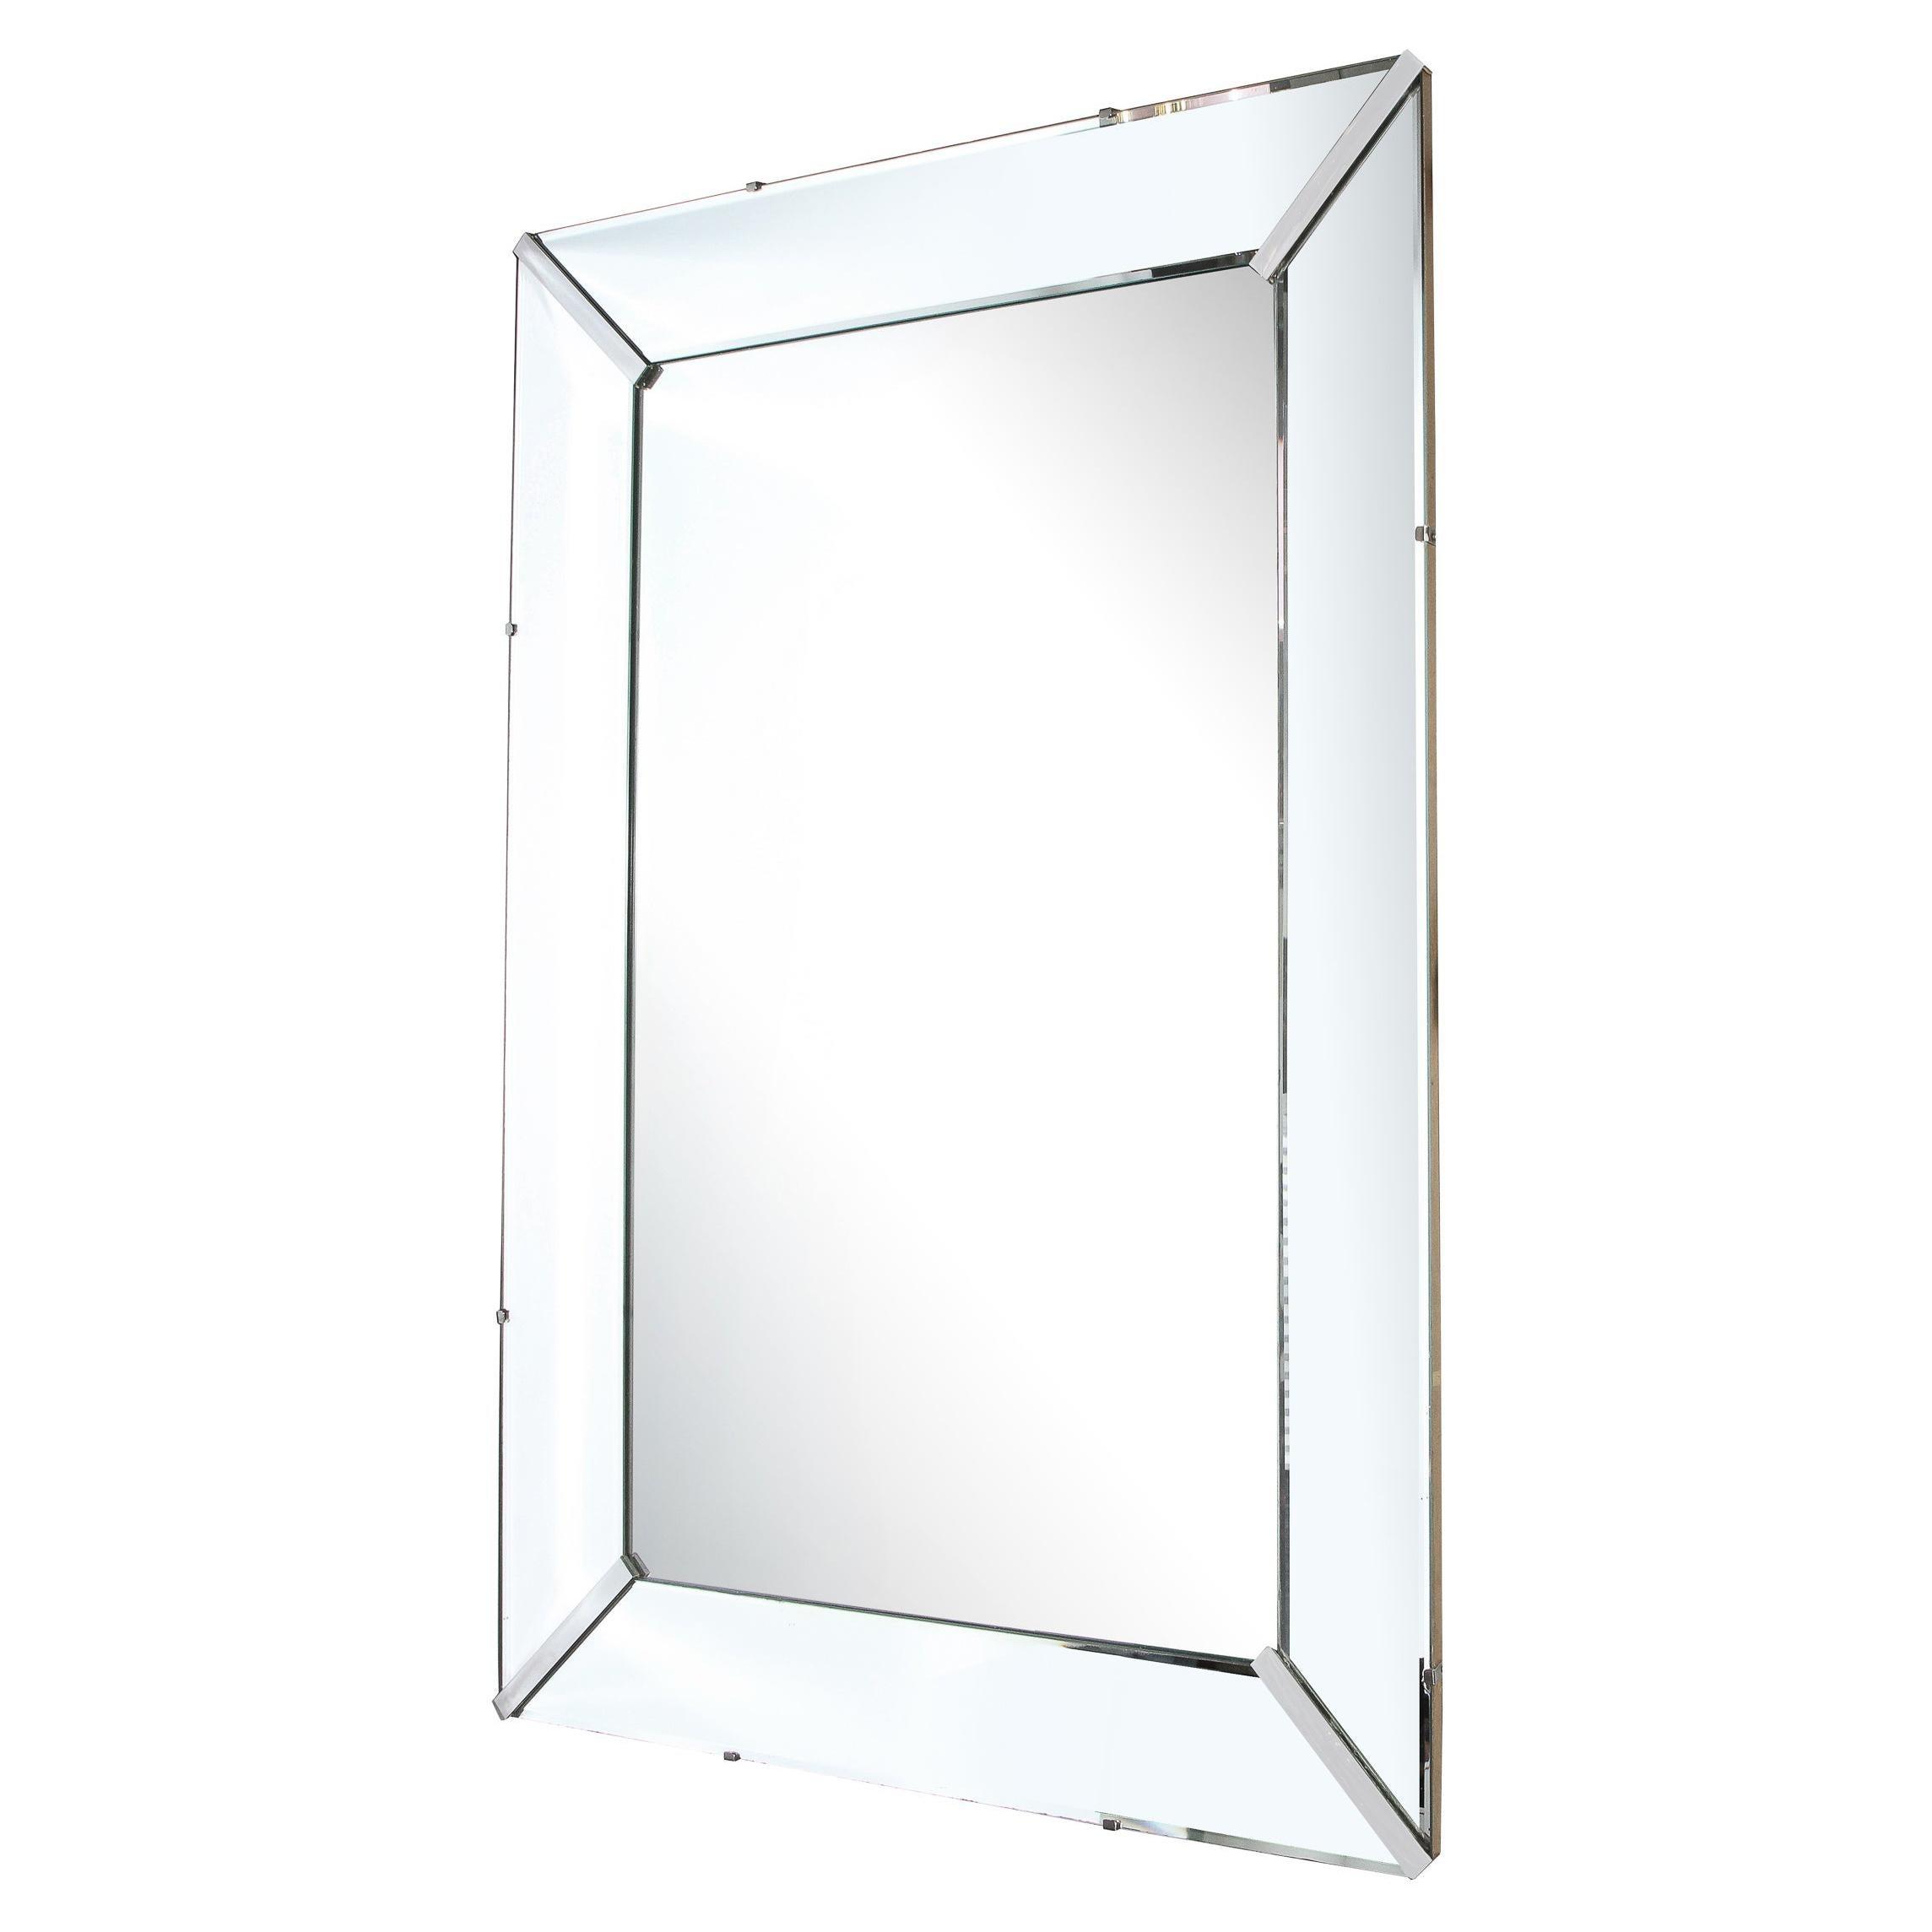 Mid-Century Modern Rectangular Shadowbox Mirror with Chrome Inserts